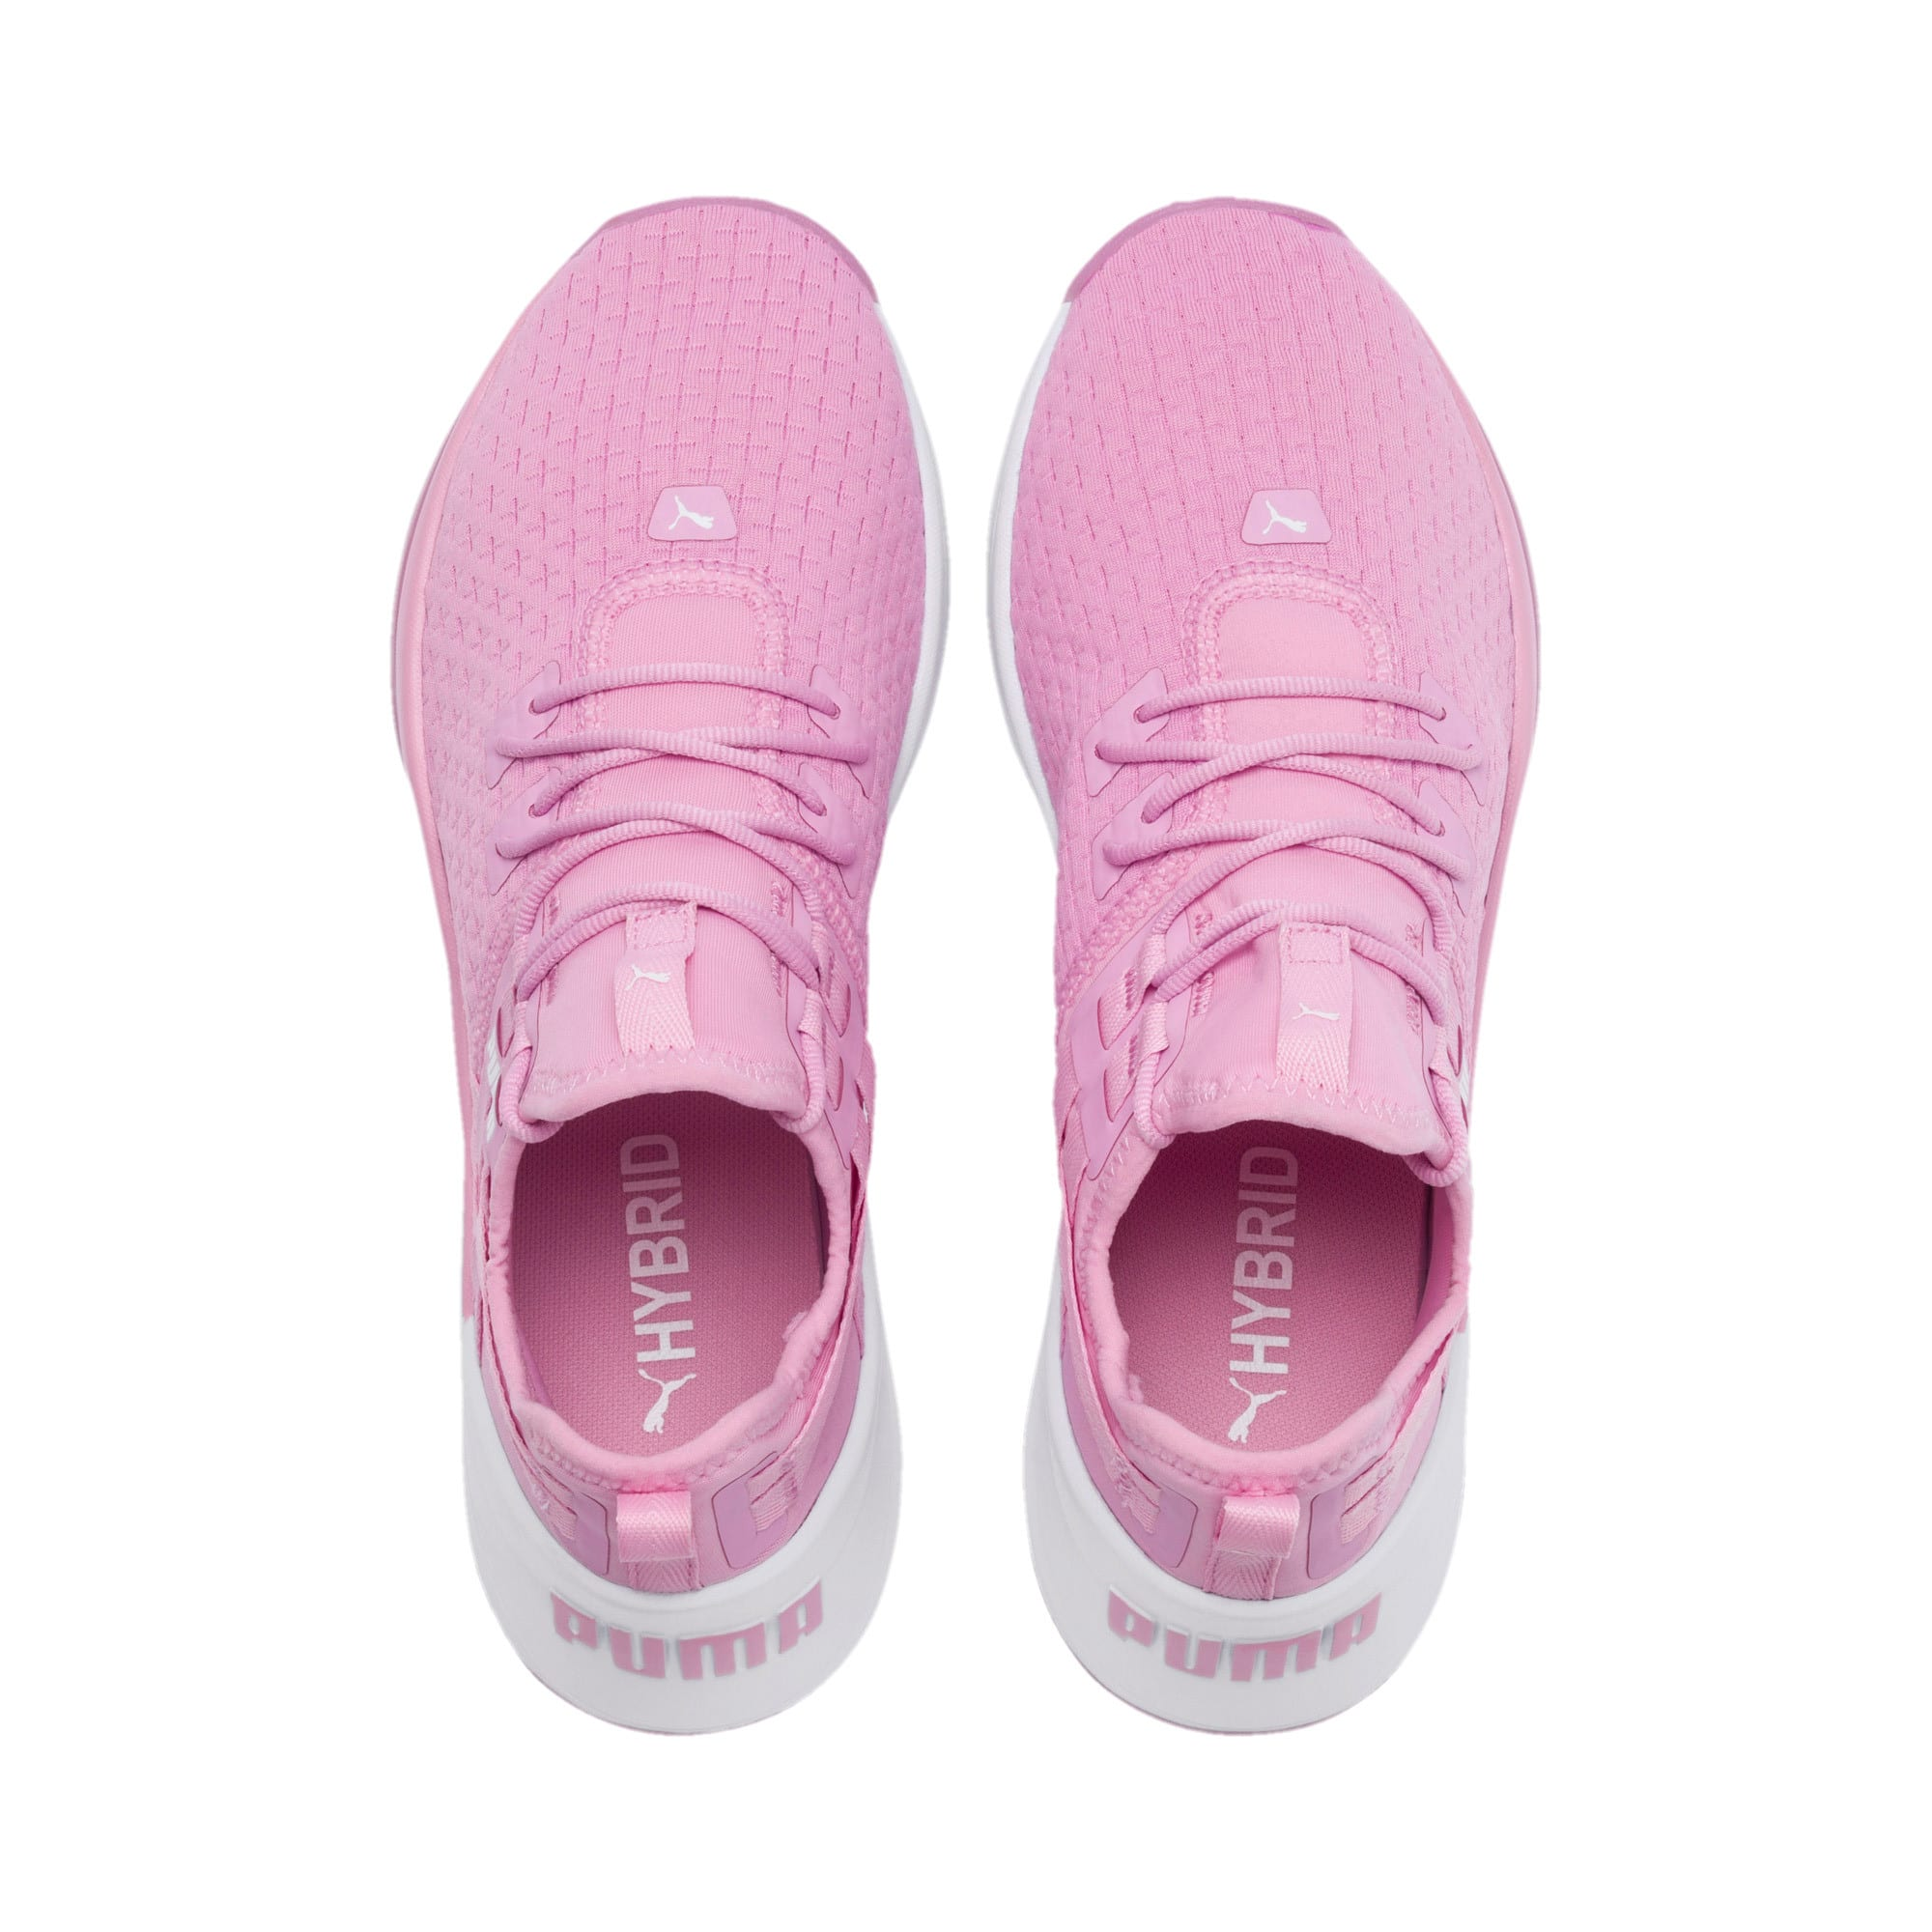 Thumbnail 6 van Jaab XT trainingssneakers voor vrouwen, Lilac Sachet-Puma White, medium